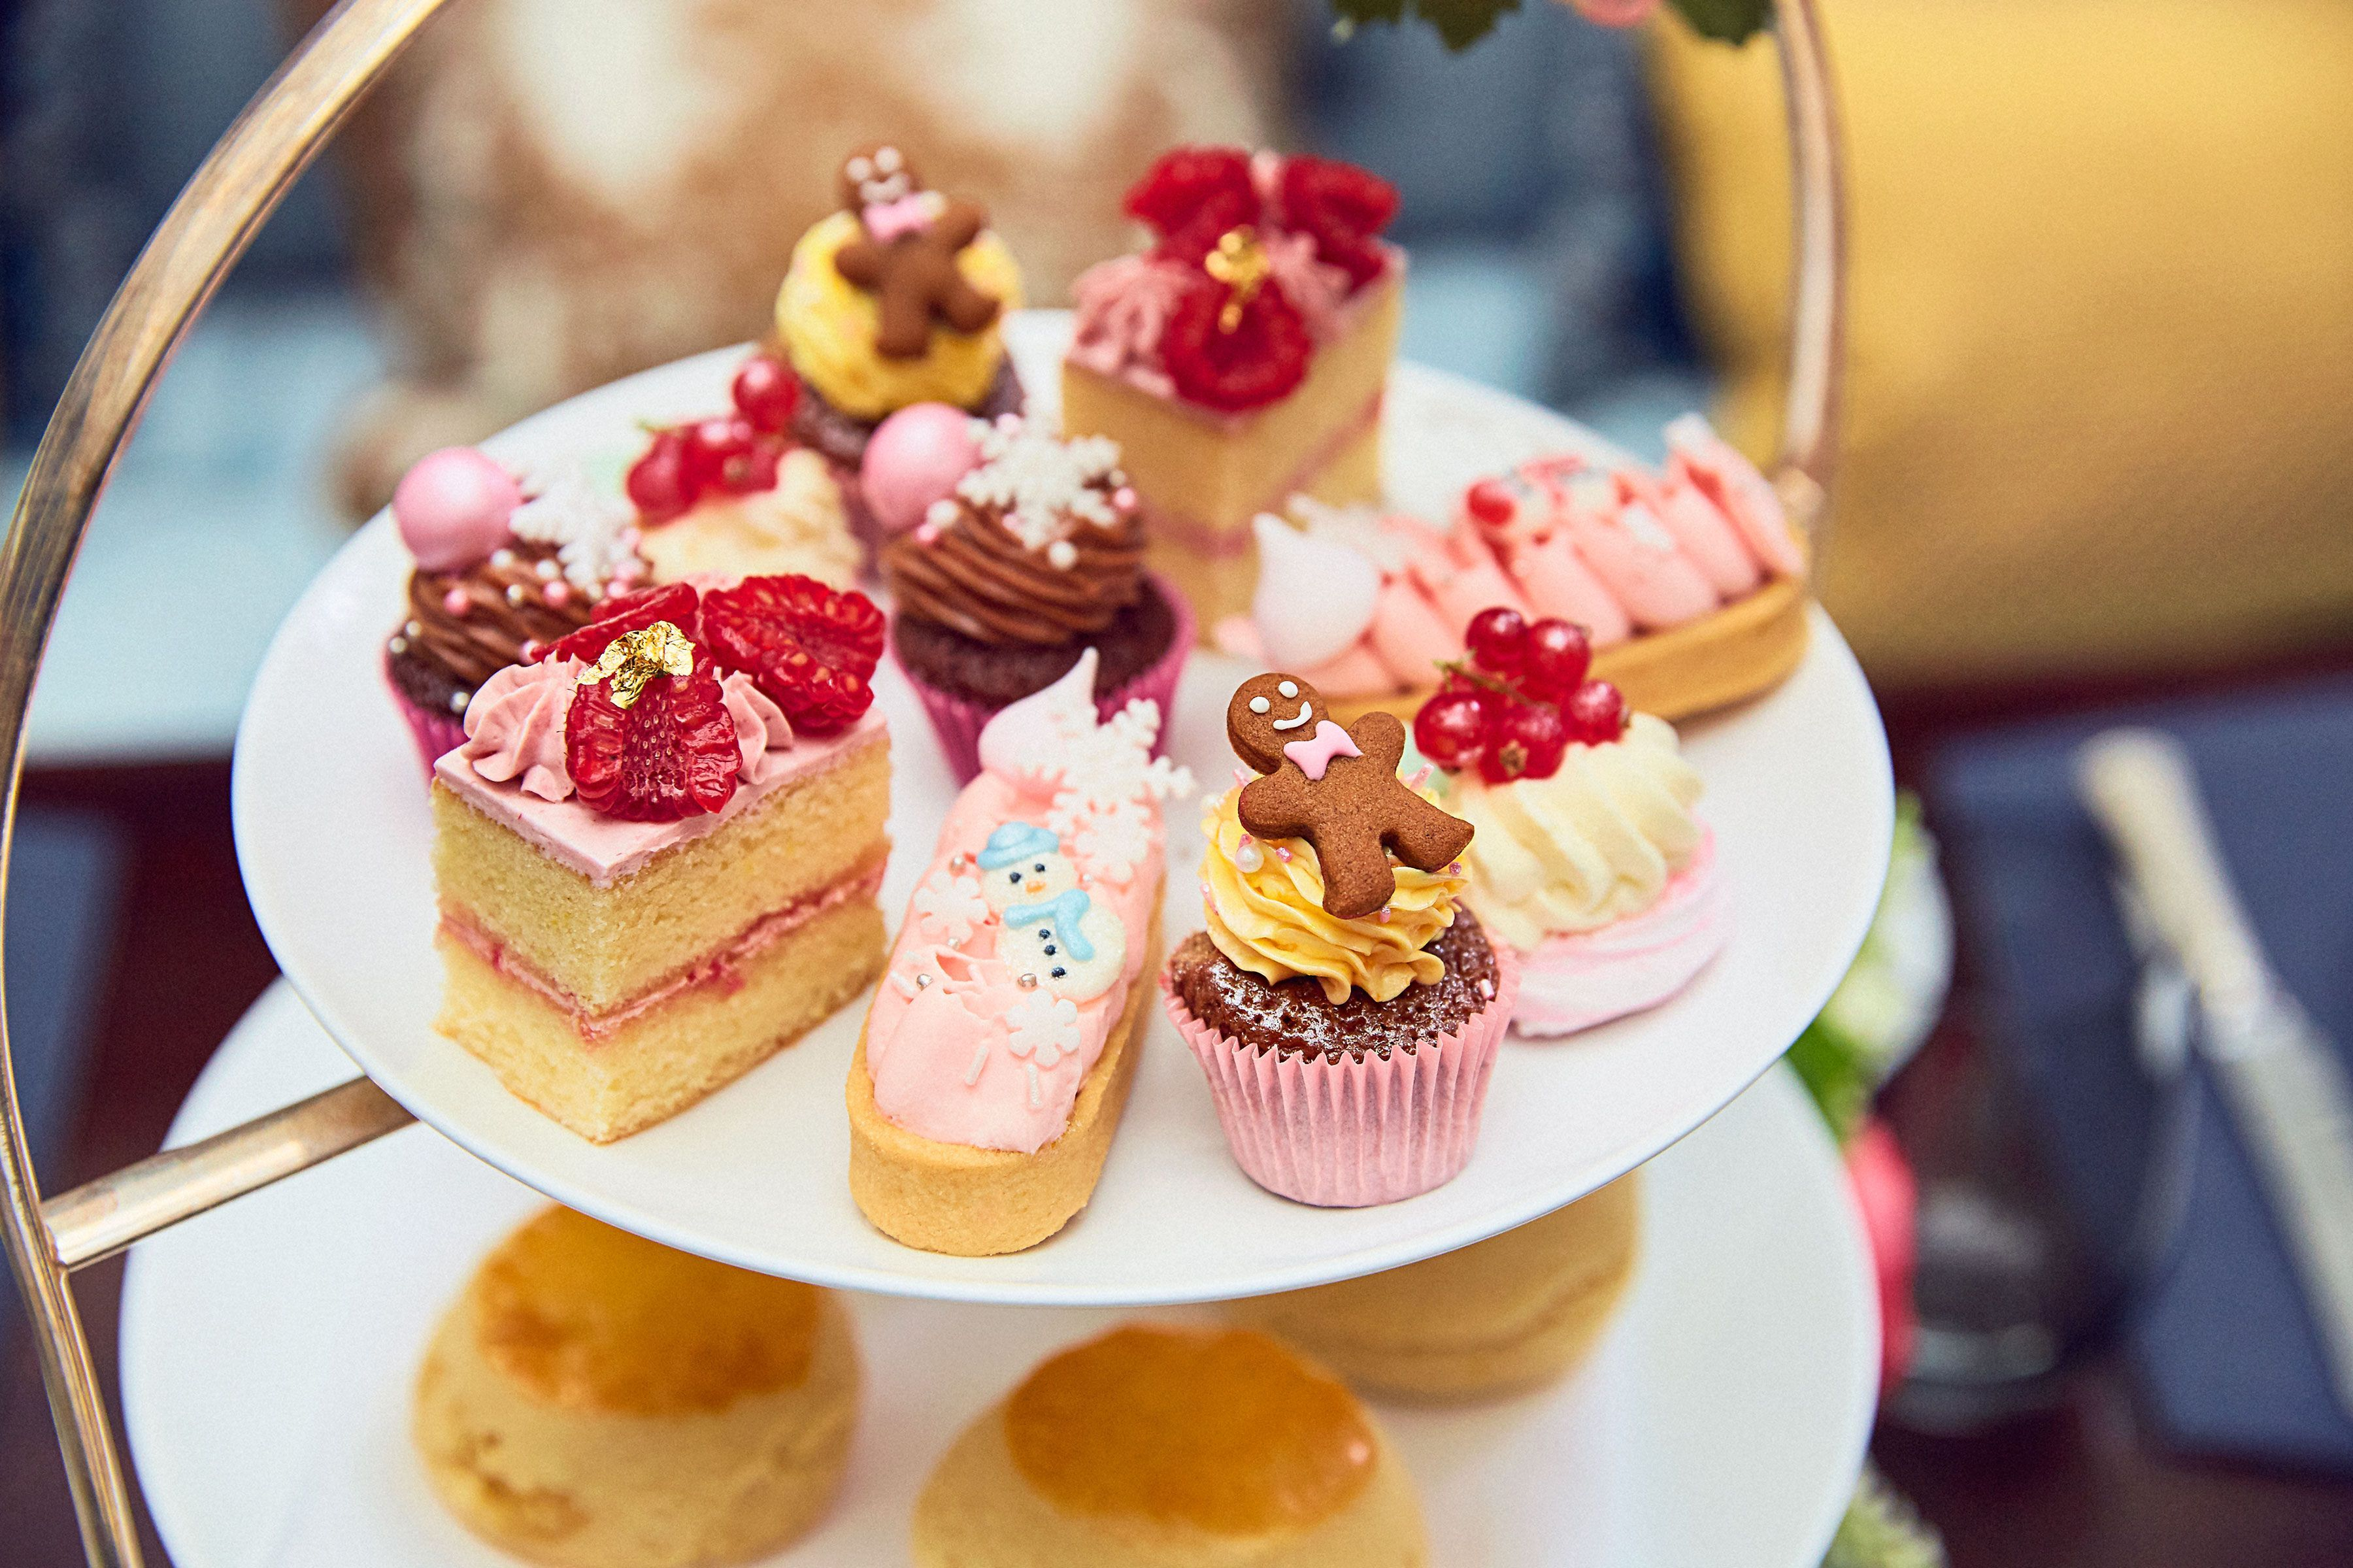 The Lanesborough Festive Afternoon Tea by Peggy Porschen 2020